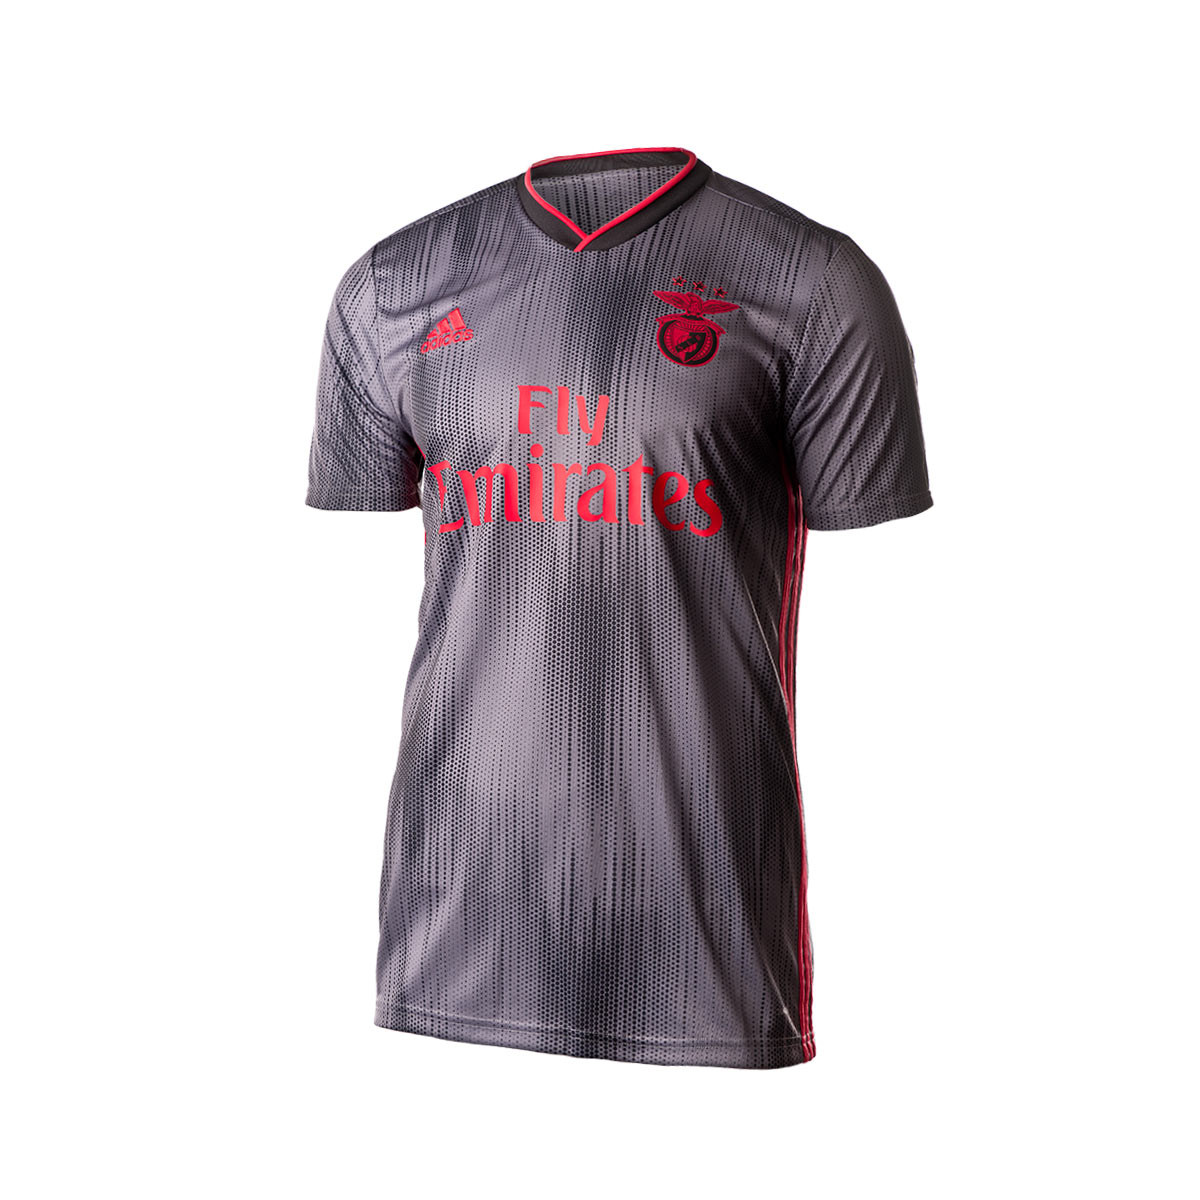 7d1aaeb115 Camiseta Benfica SL Segunda Equipación 2019-2020 Black-Grey